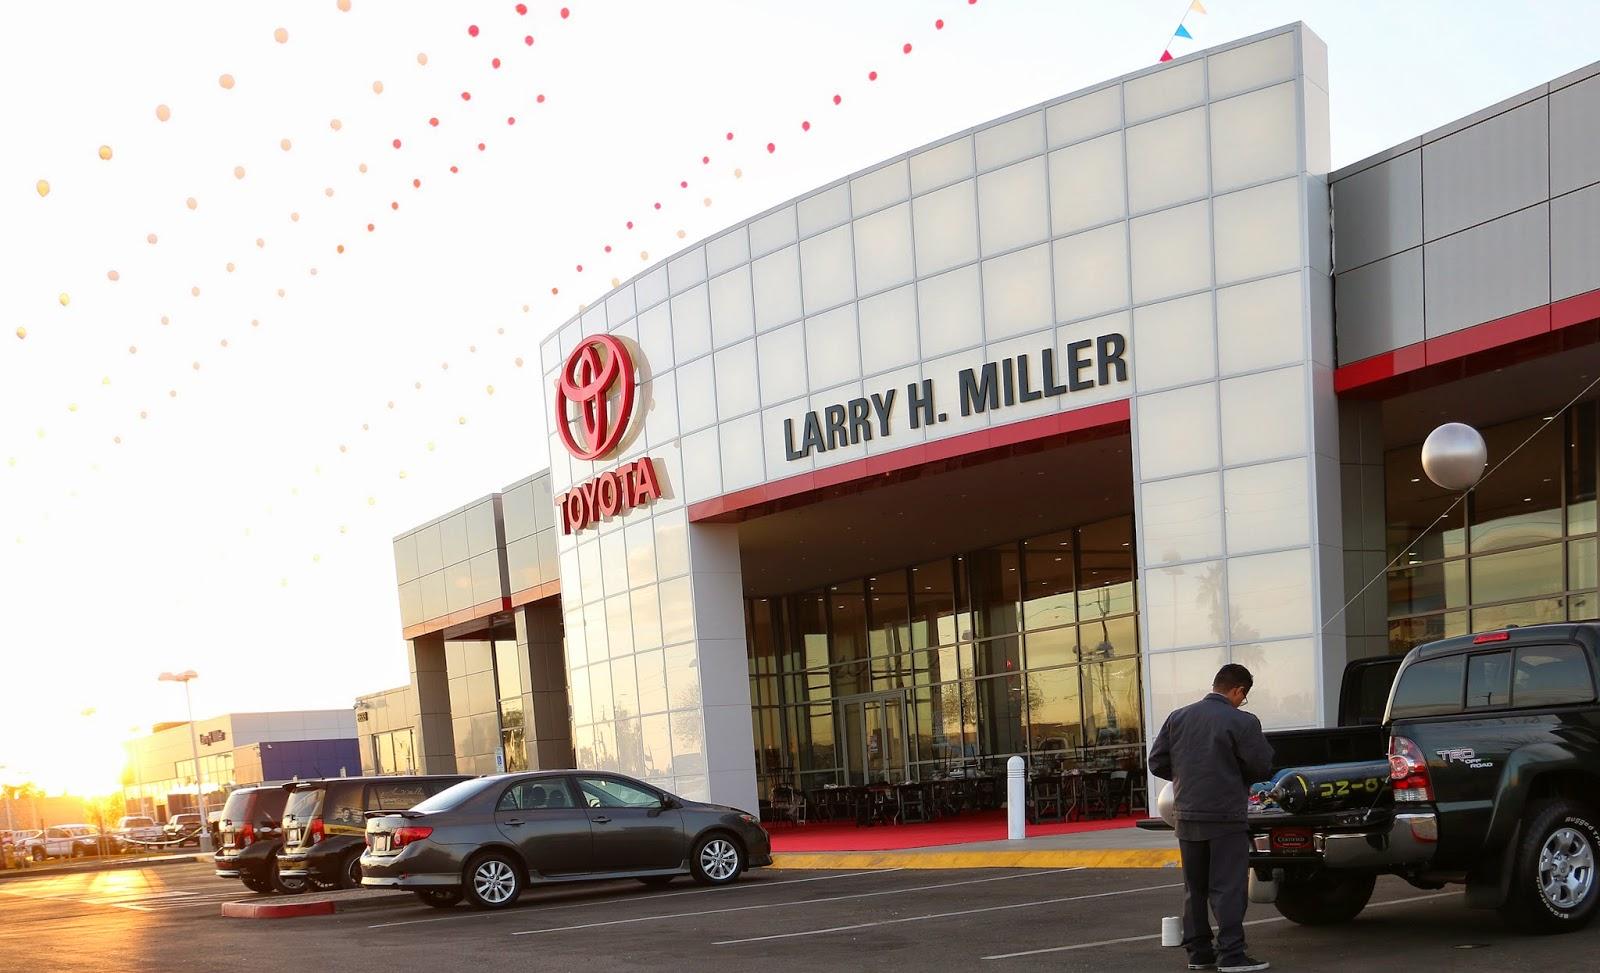 Marvelous Larry H. Miller Toyota Peoria